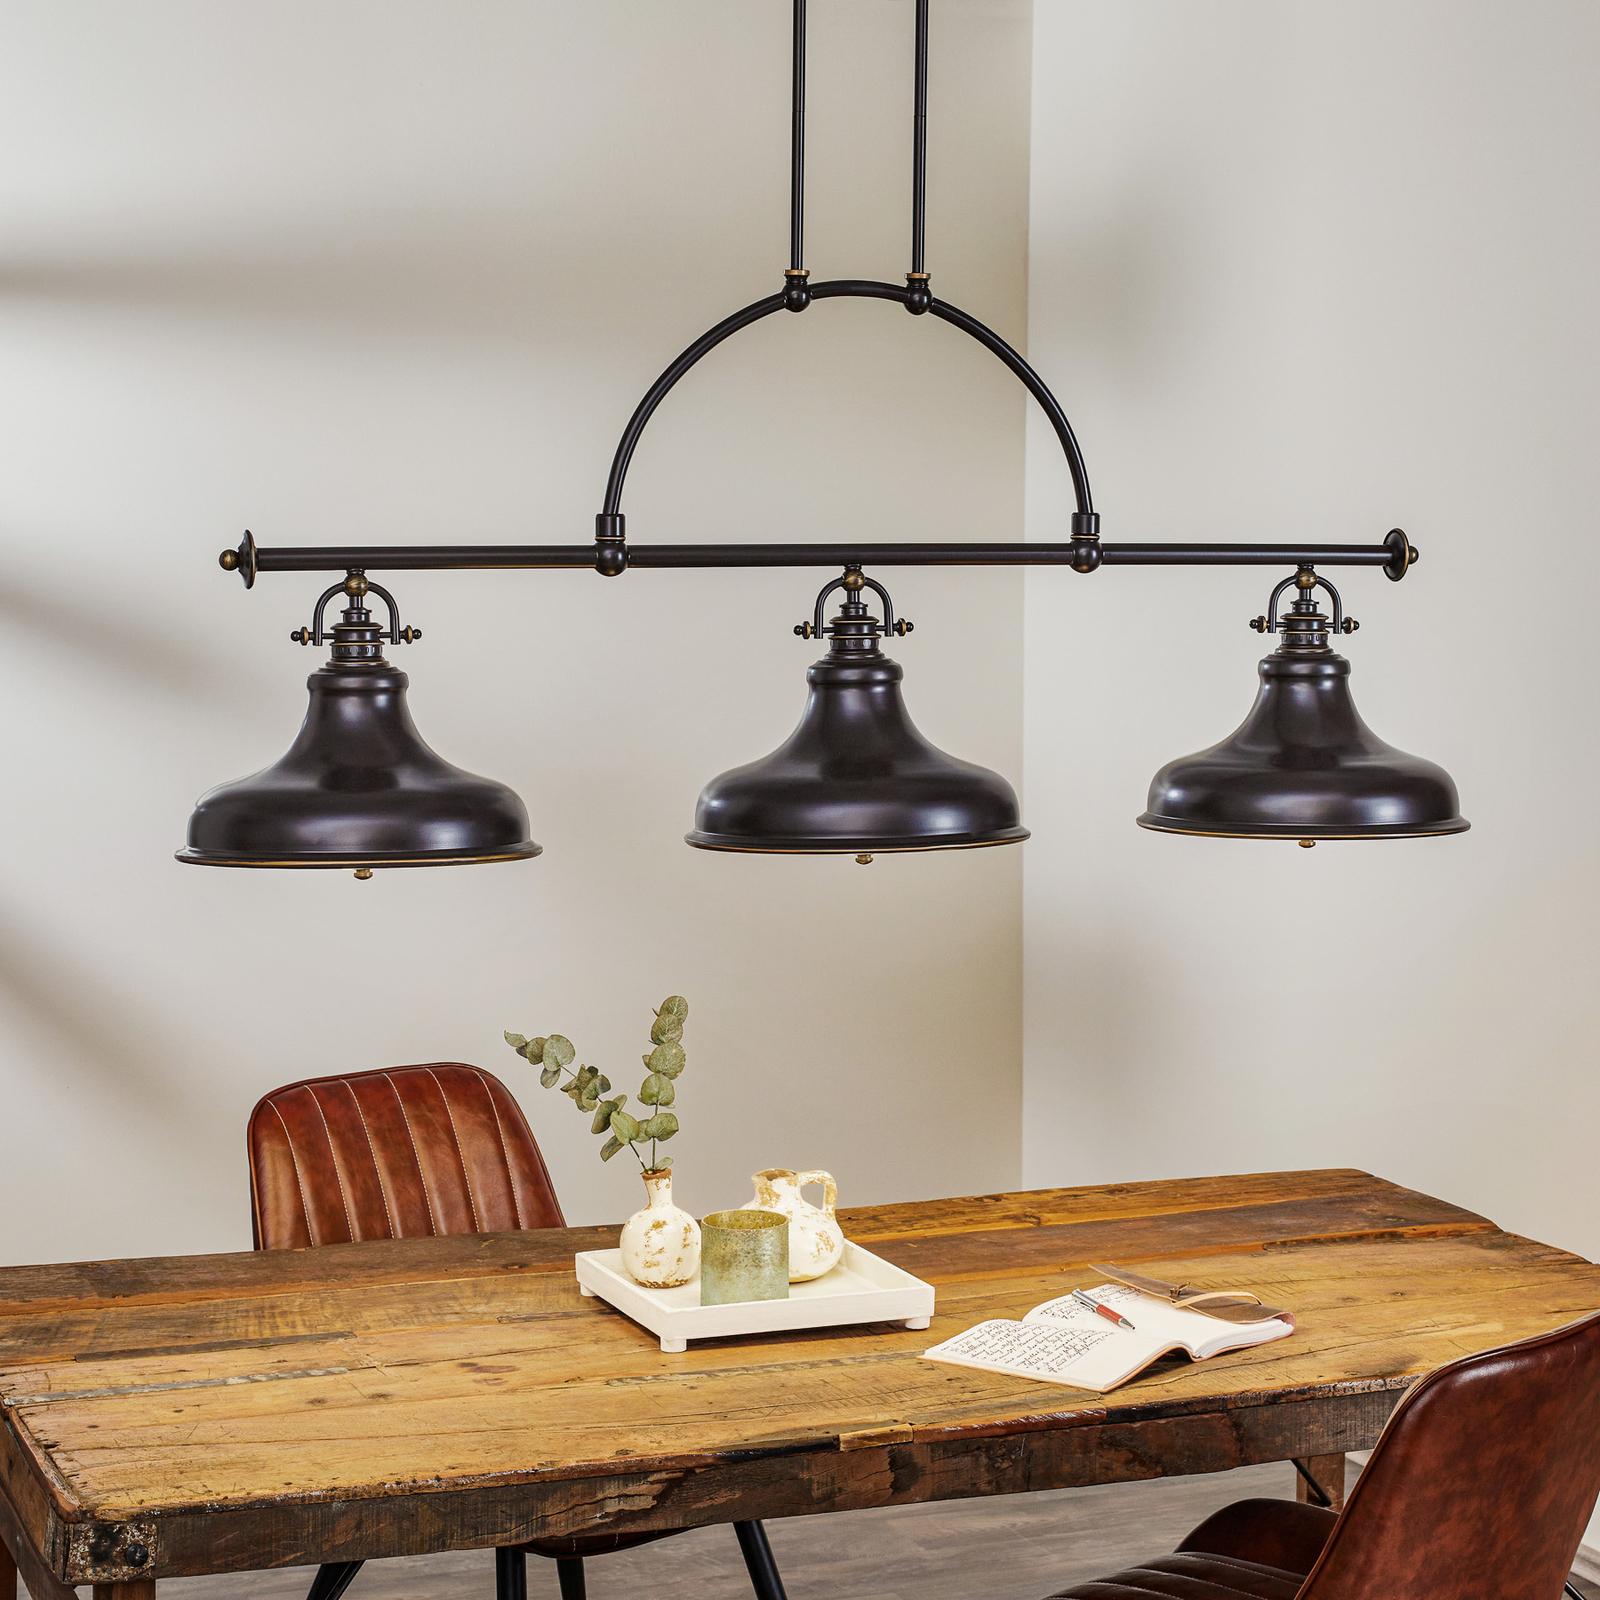 Emery sospensione stile industriale bronzo 3 luci